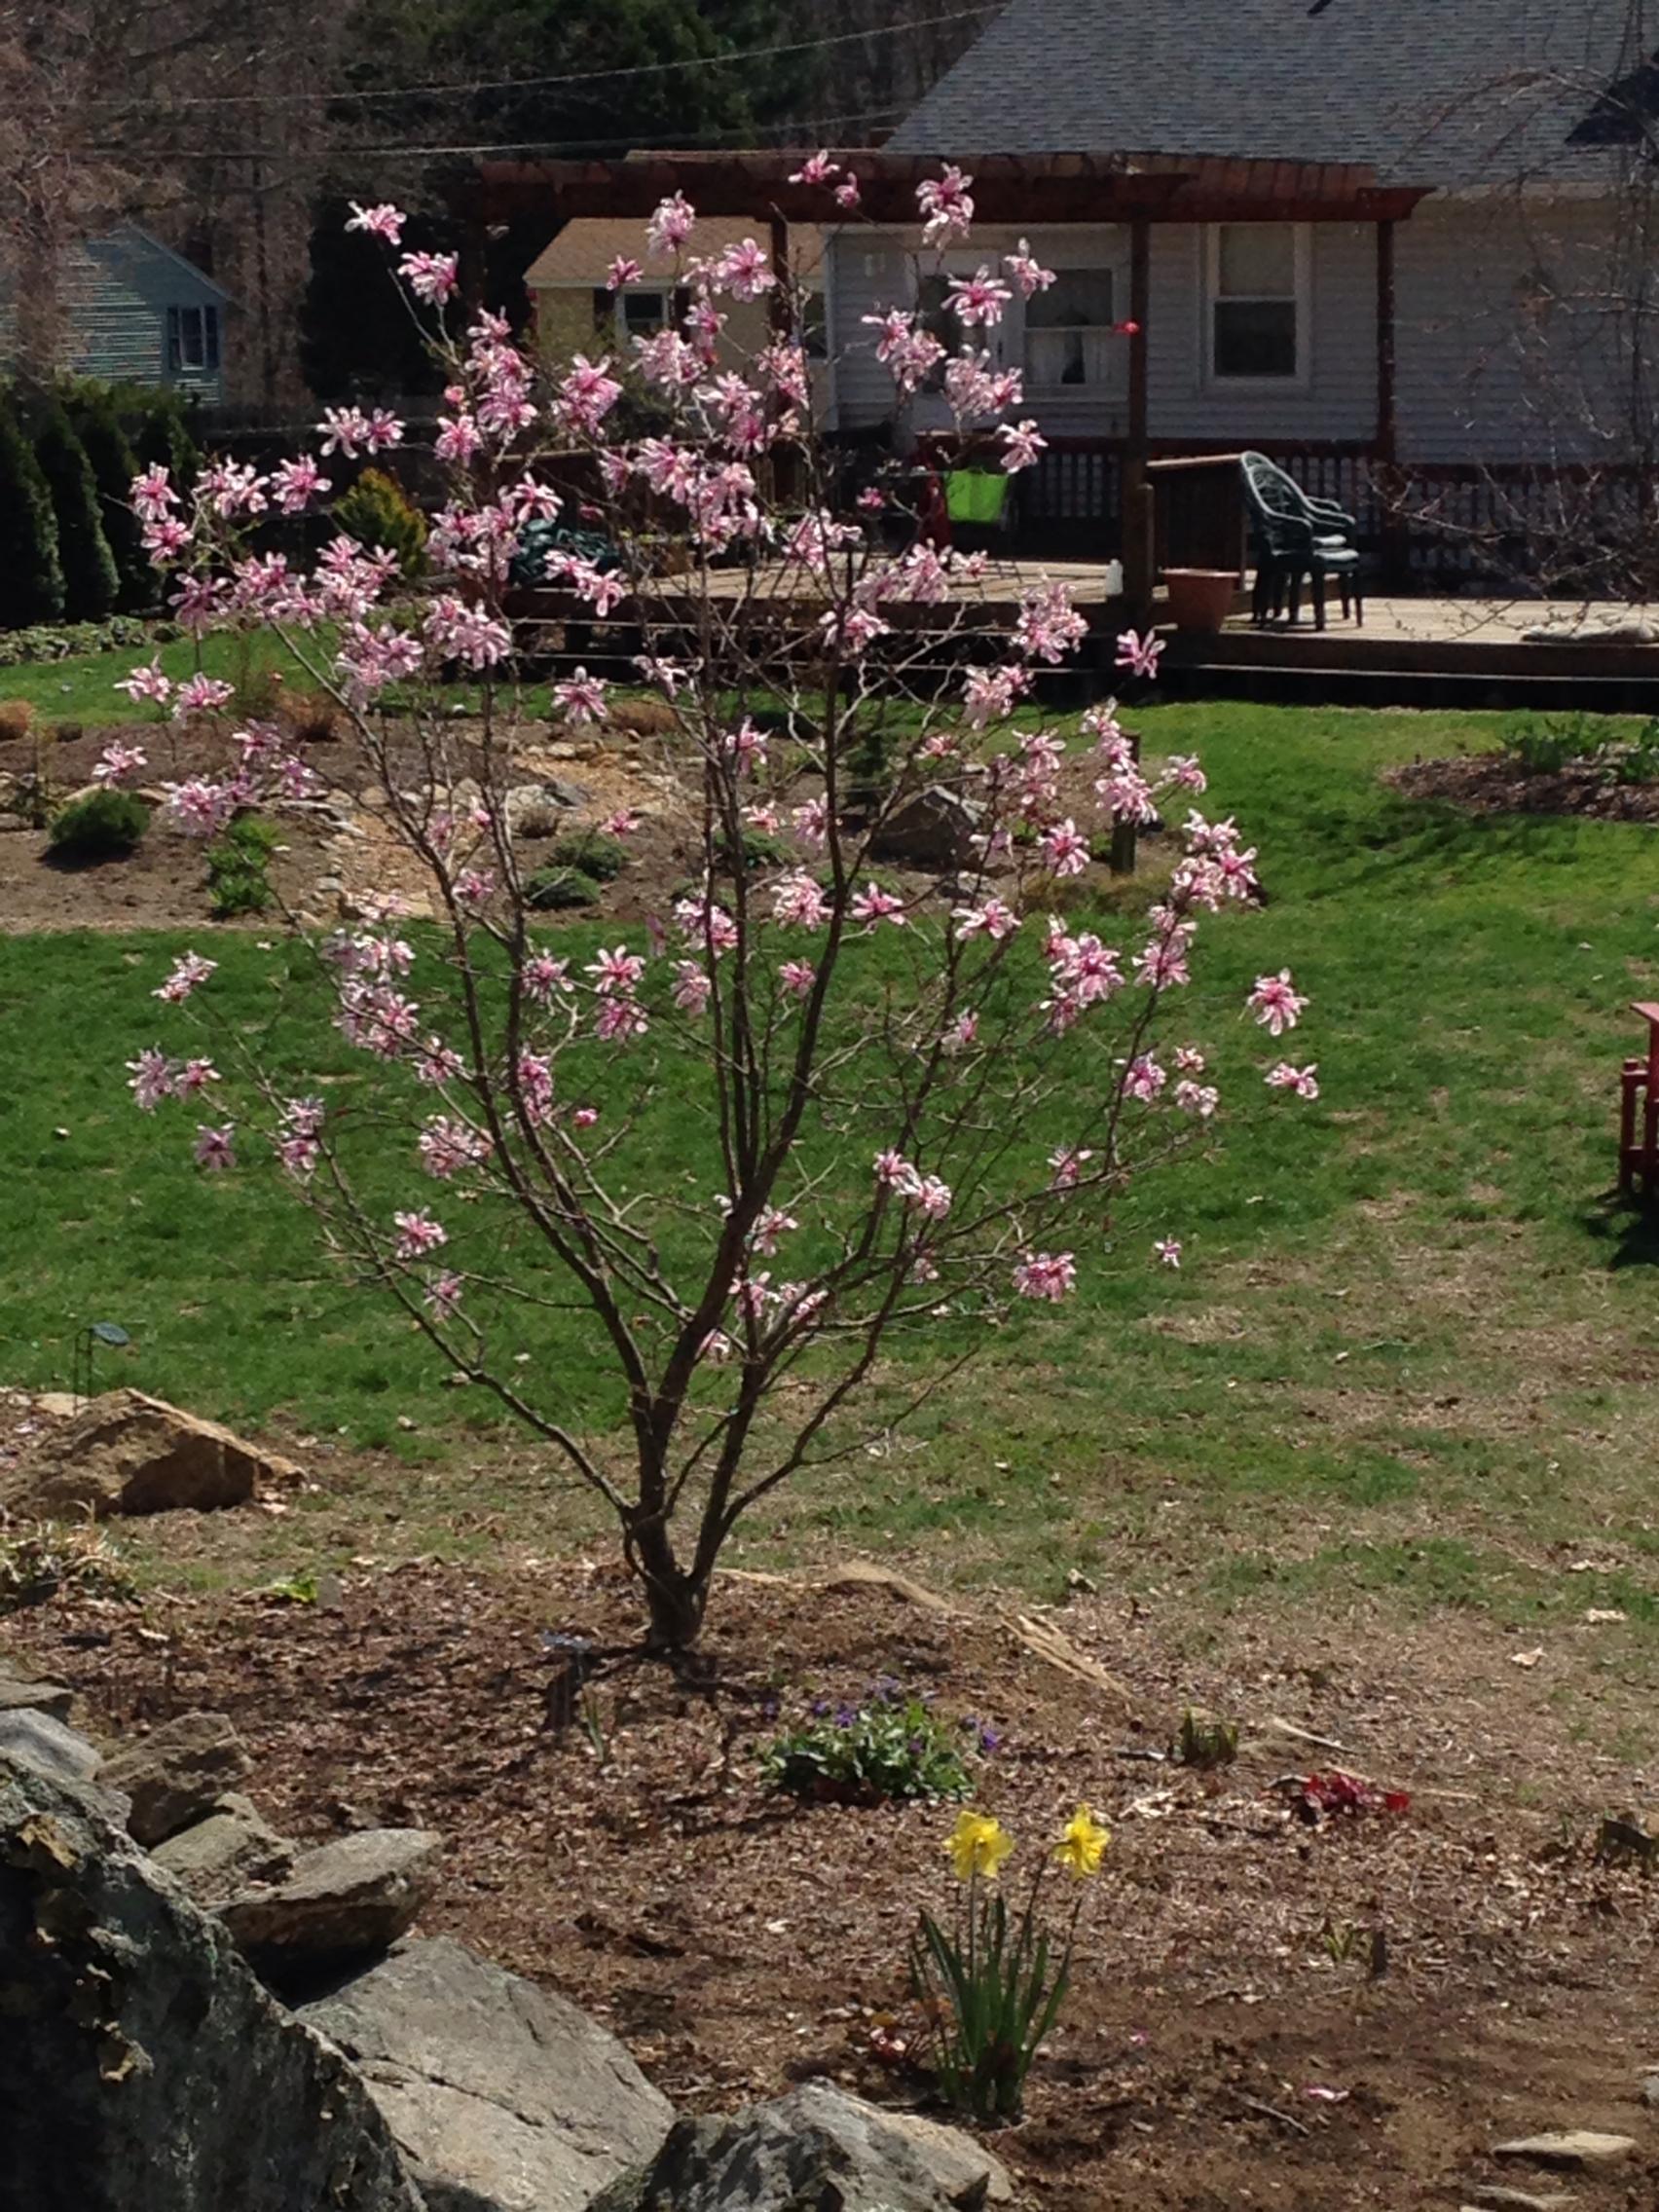 Garden on April 25